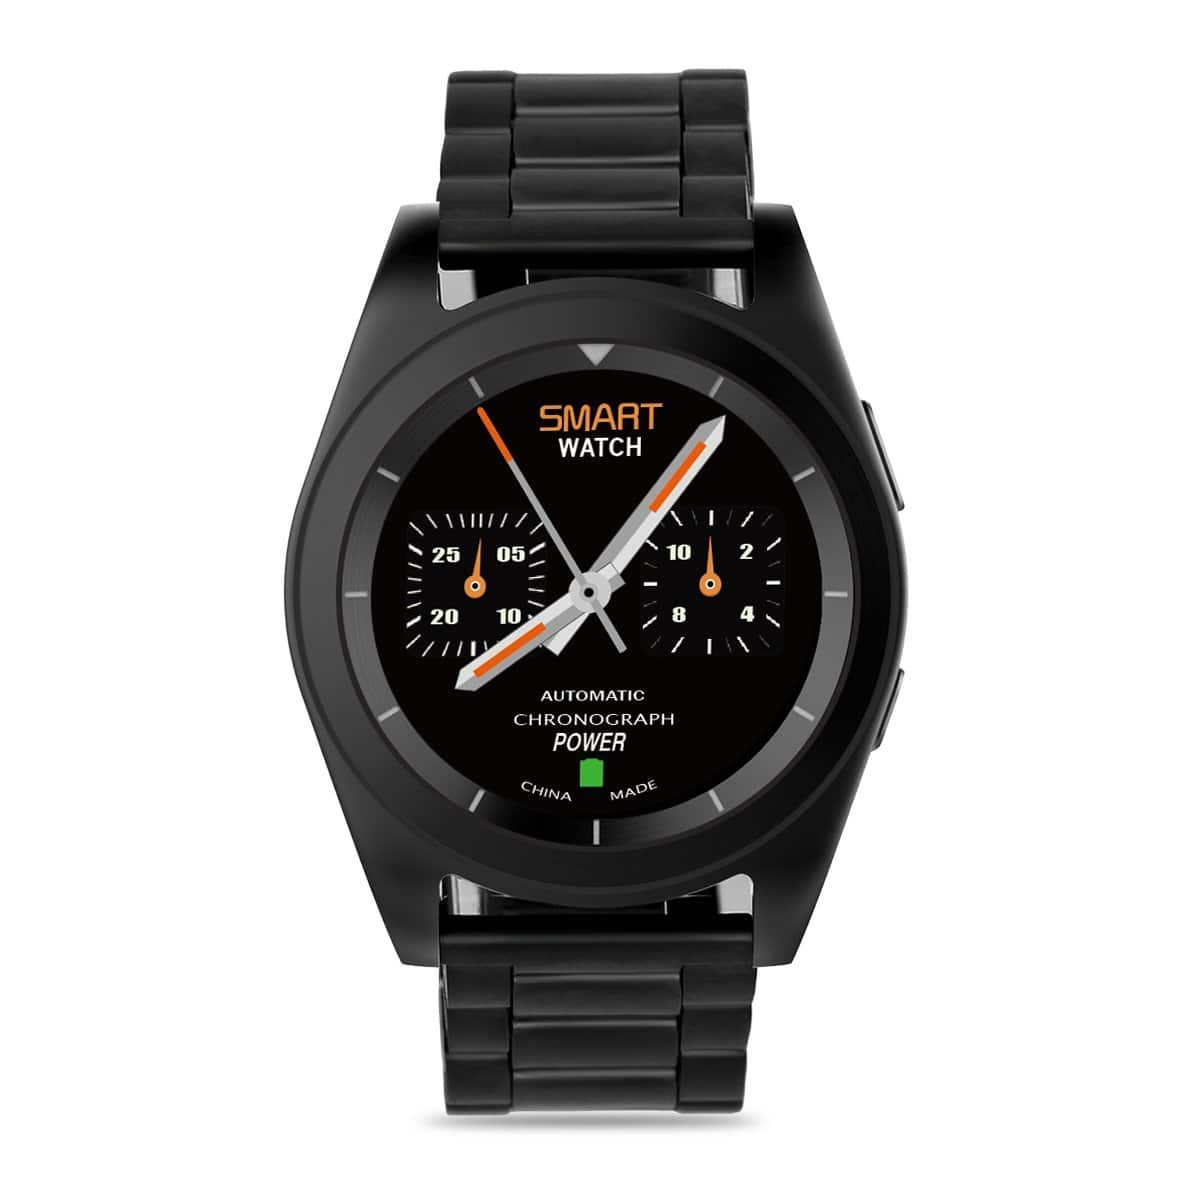 70% OFF NO.1 G6 - Bluetooth Smart Watch Heart Rate Smartwatch ( Heart Rate Monitor, Pedometer, Sleep Monitor) $12.59